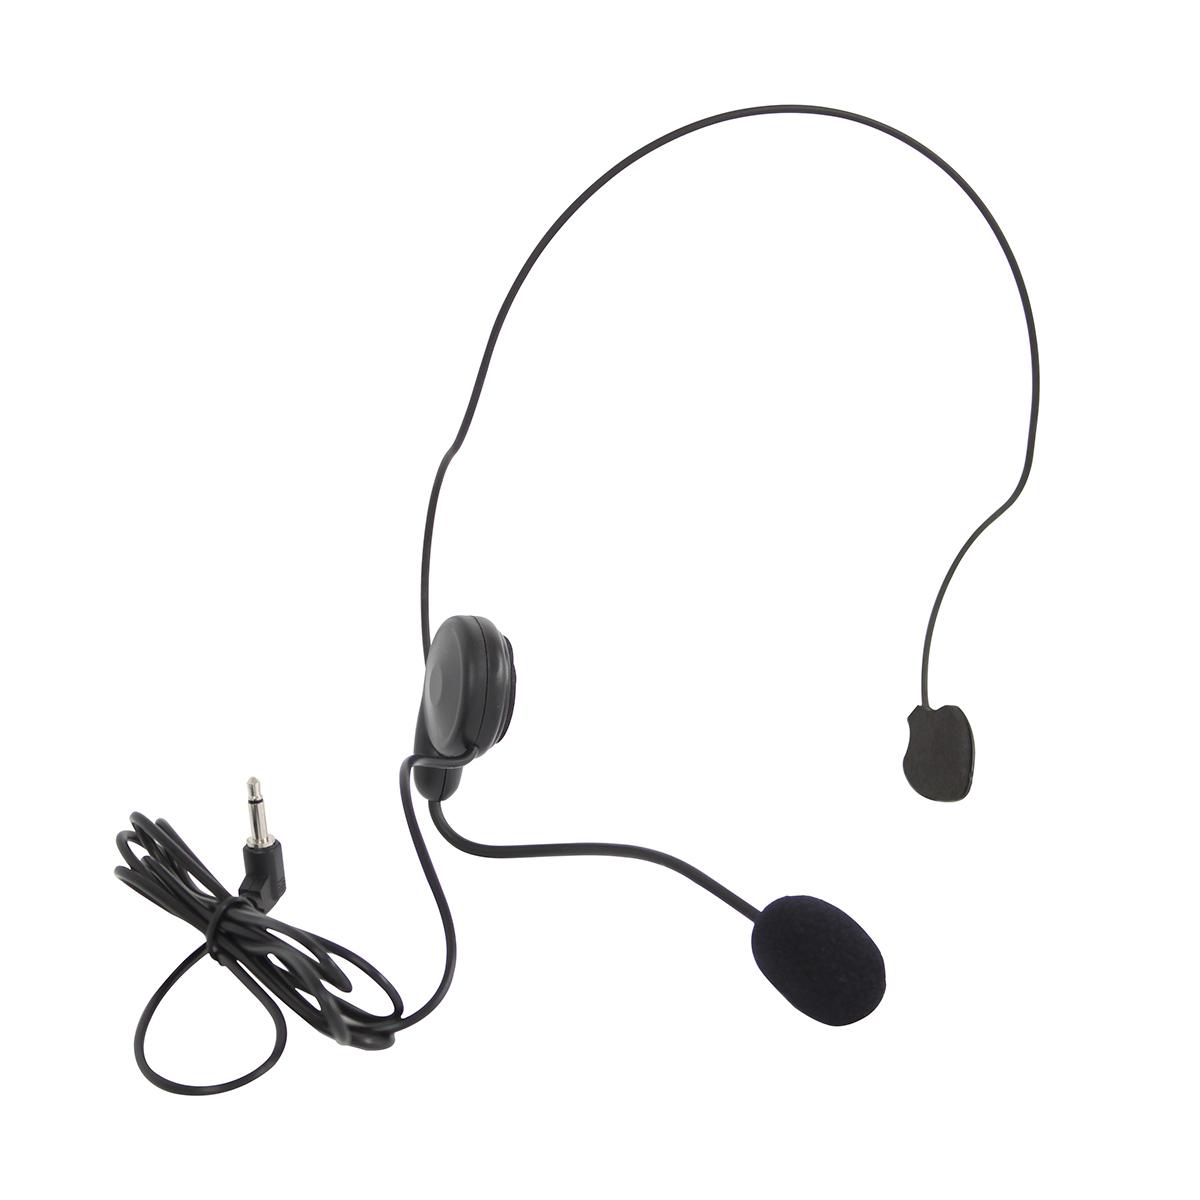 MINIV  - Microfone s/ Fio Headset / Cabeça UHF MINI V - SKP